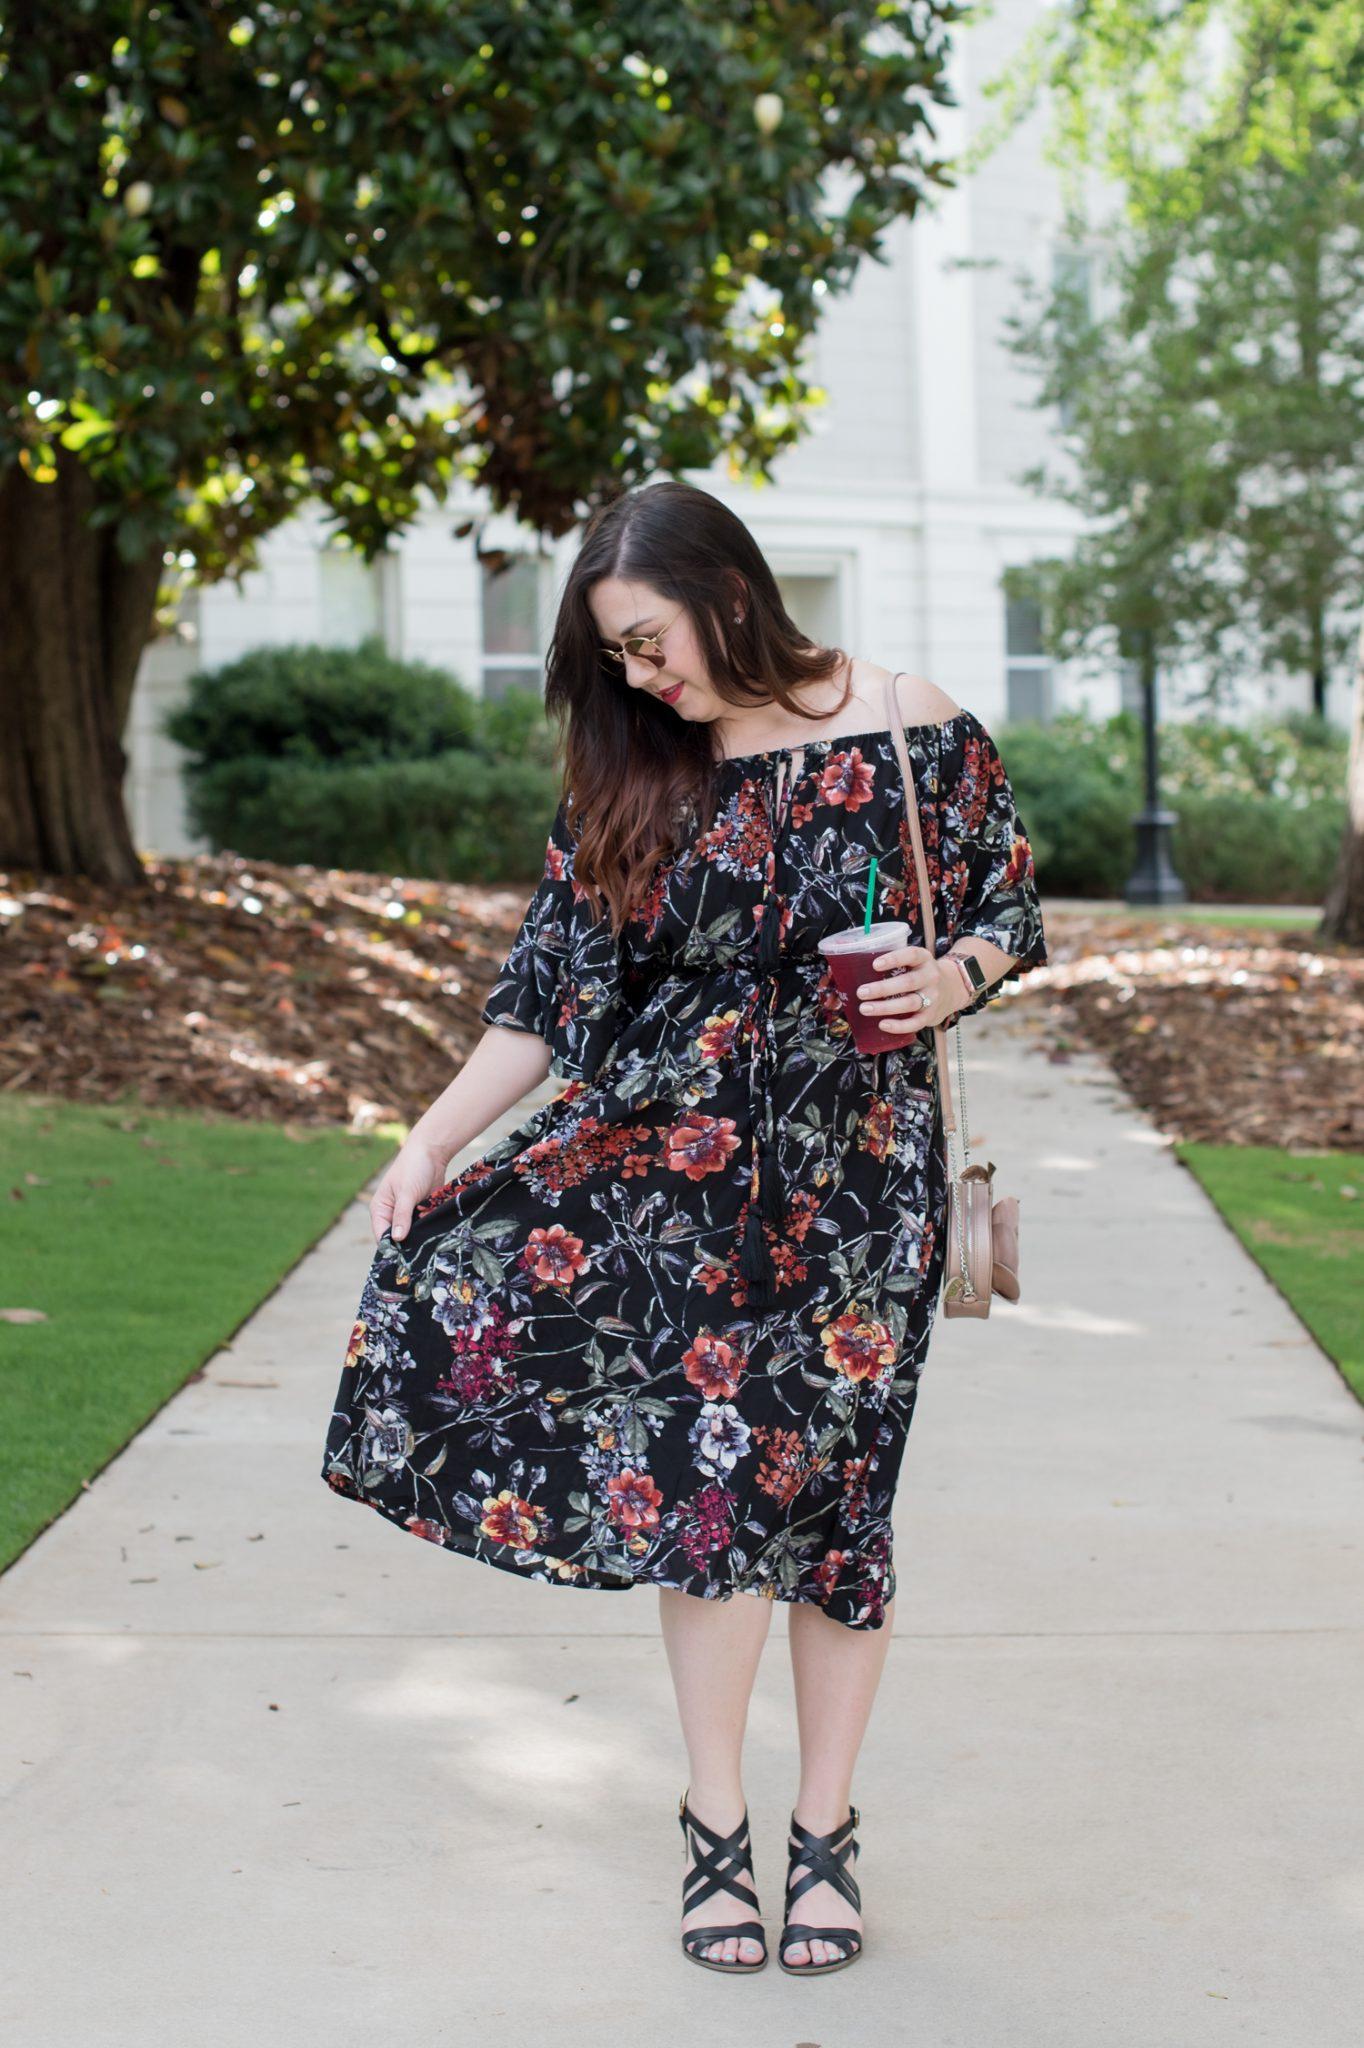 A Flirty Floral Off-the-Shoulder Dress via @missmollymoon